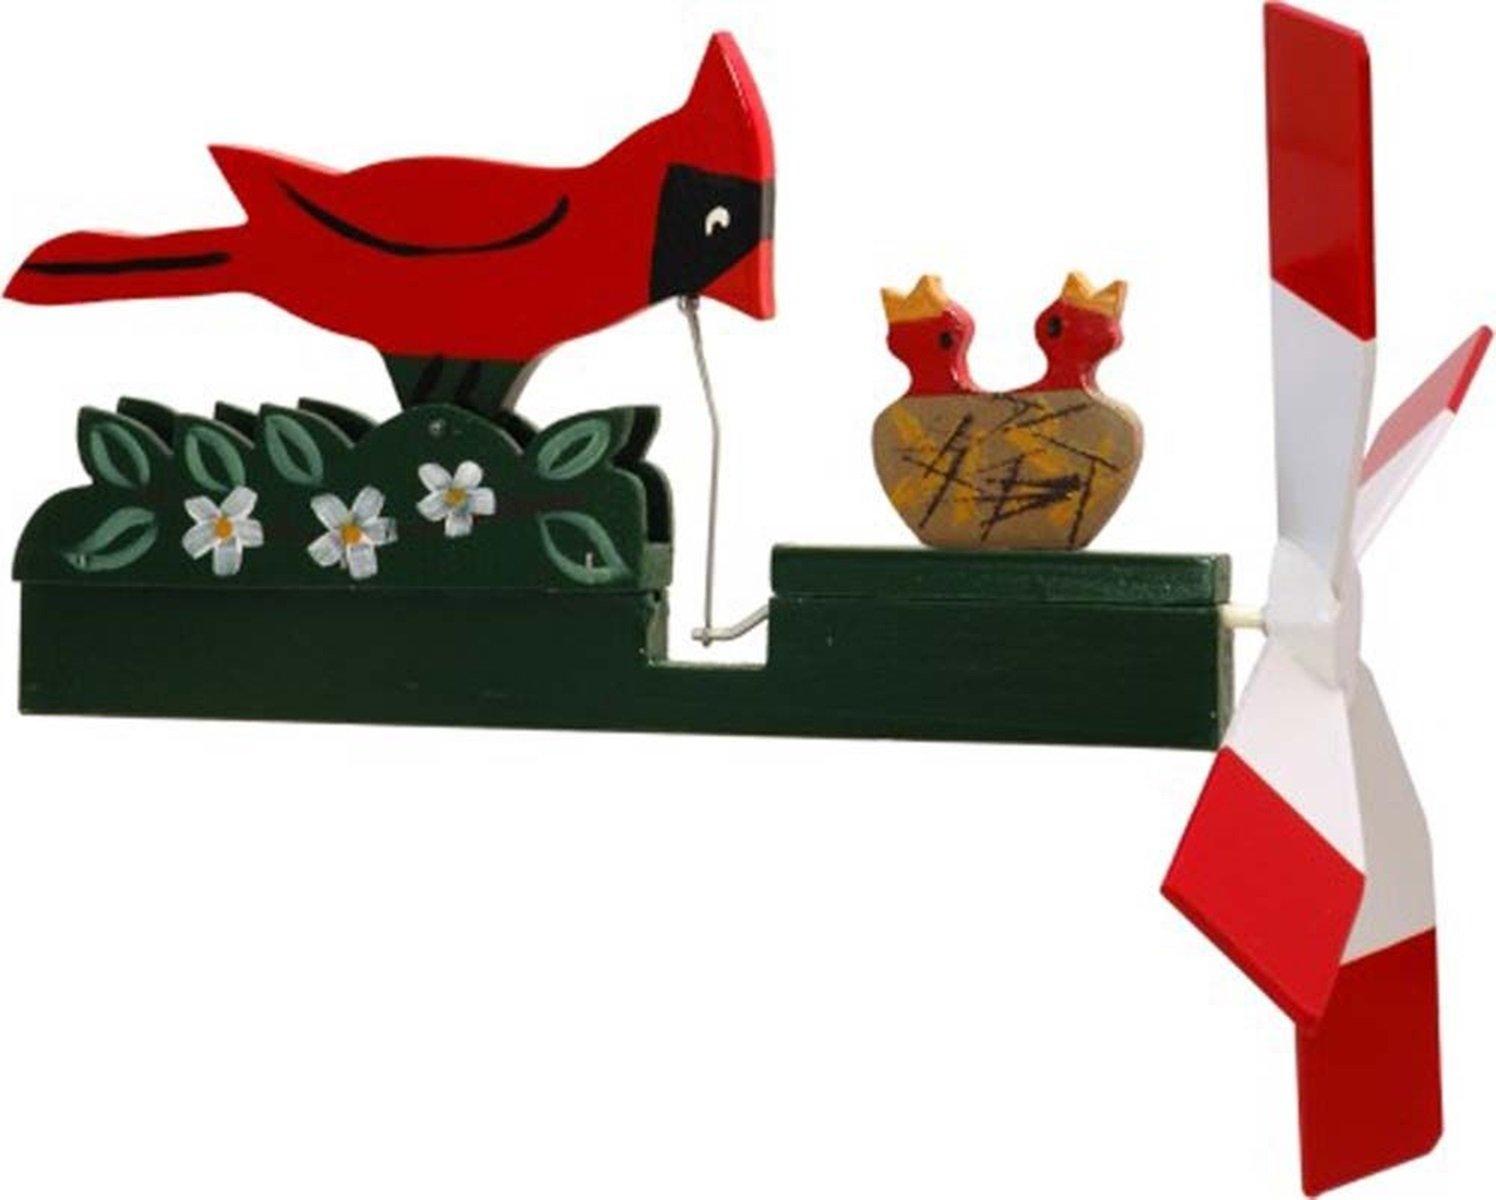 CHSGJY Handcrafted Antique Garden Cardinal Whirligig - Handmade Handpainted Wood Wind Spinner Outdoor Art Yard Stake Hand Home Living Decor